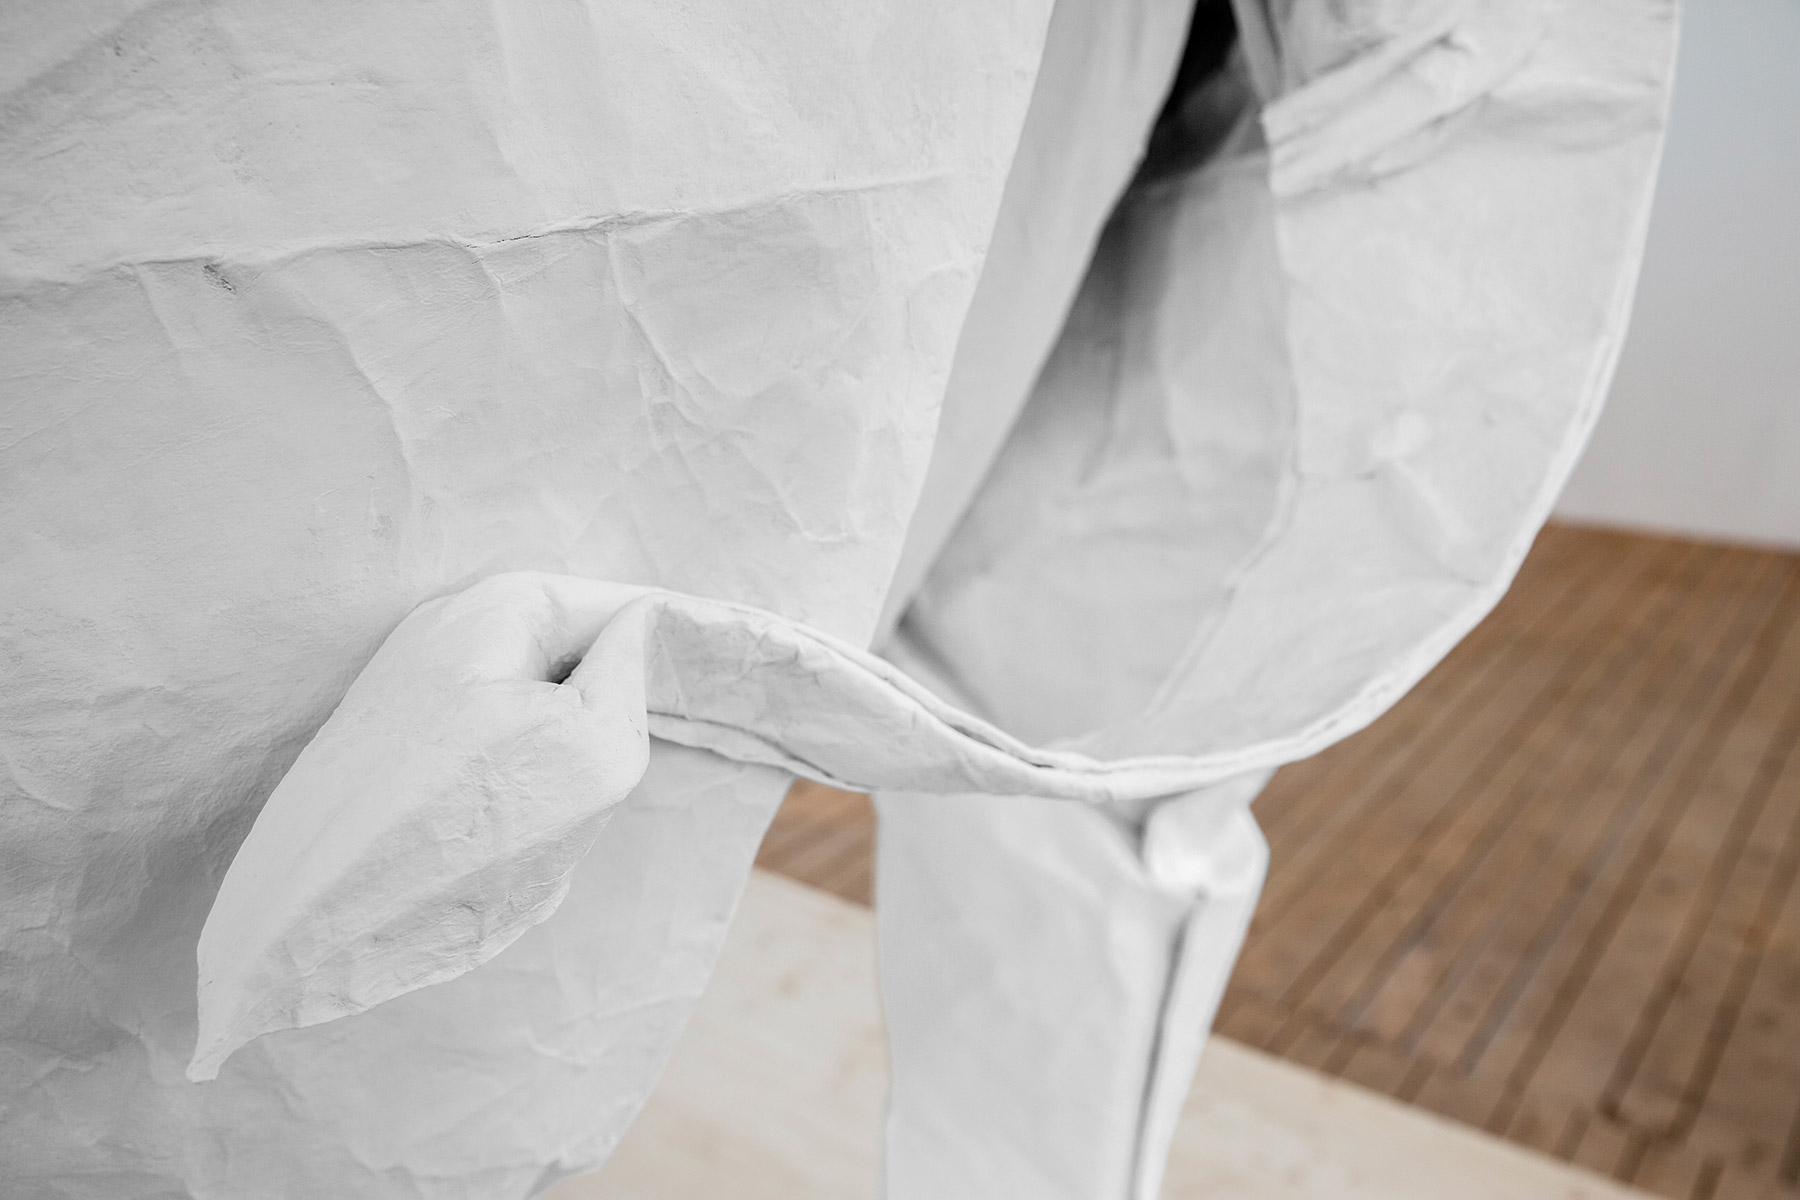 paper-elephant-sipho-mabona-04